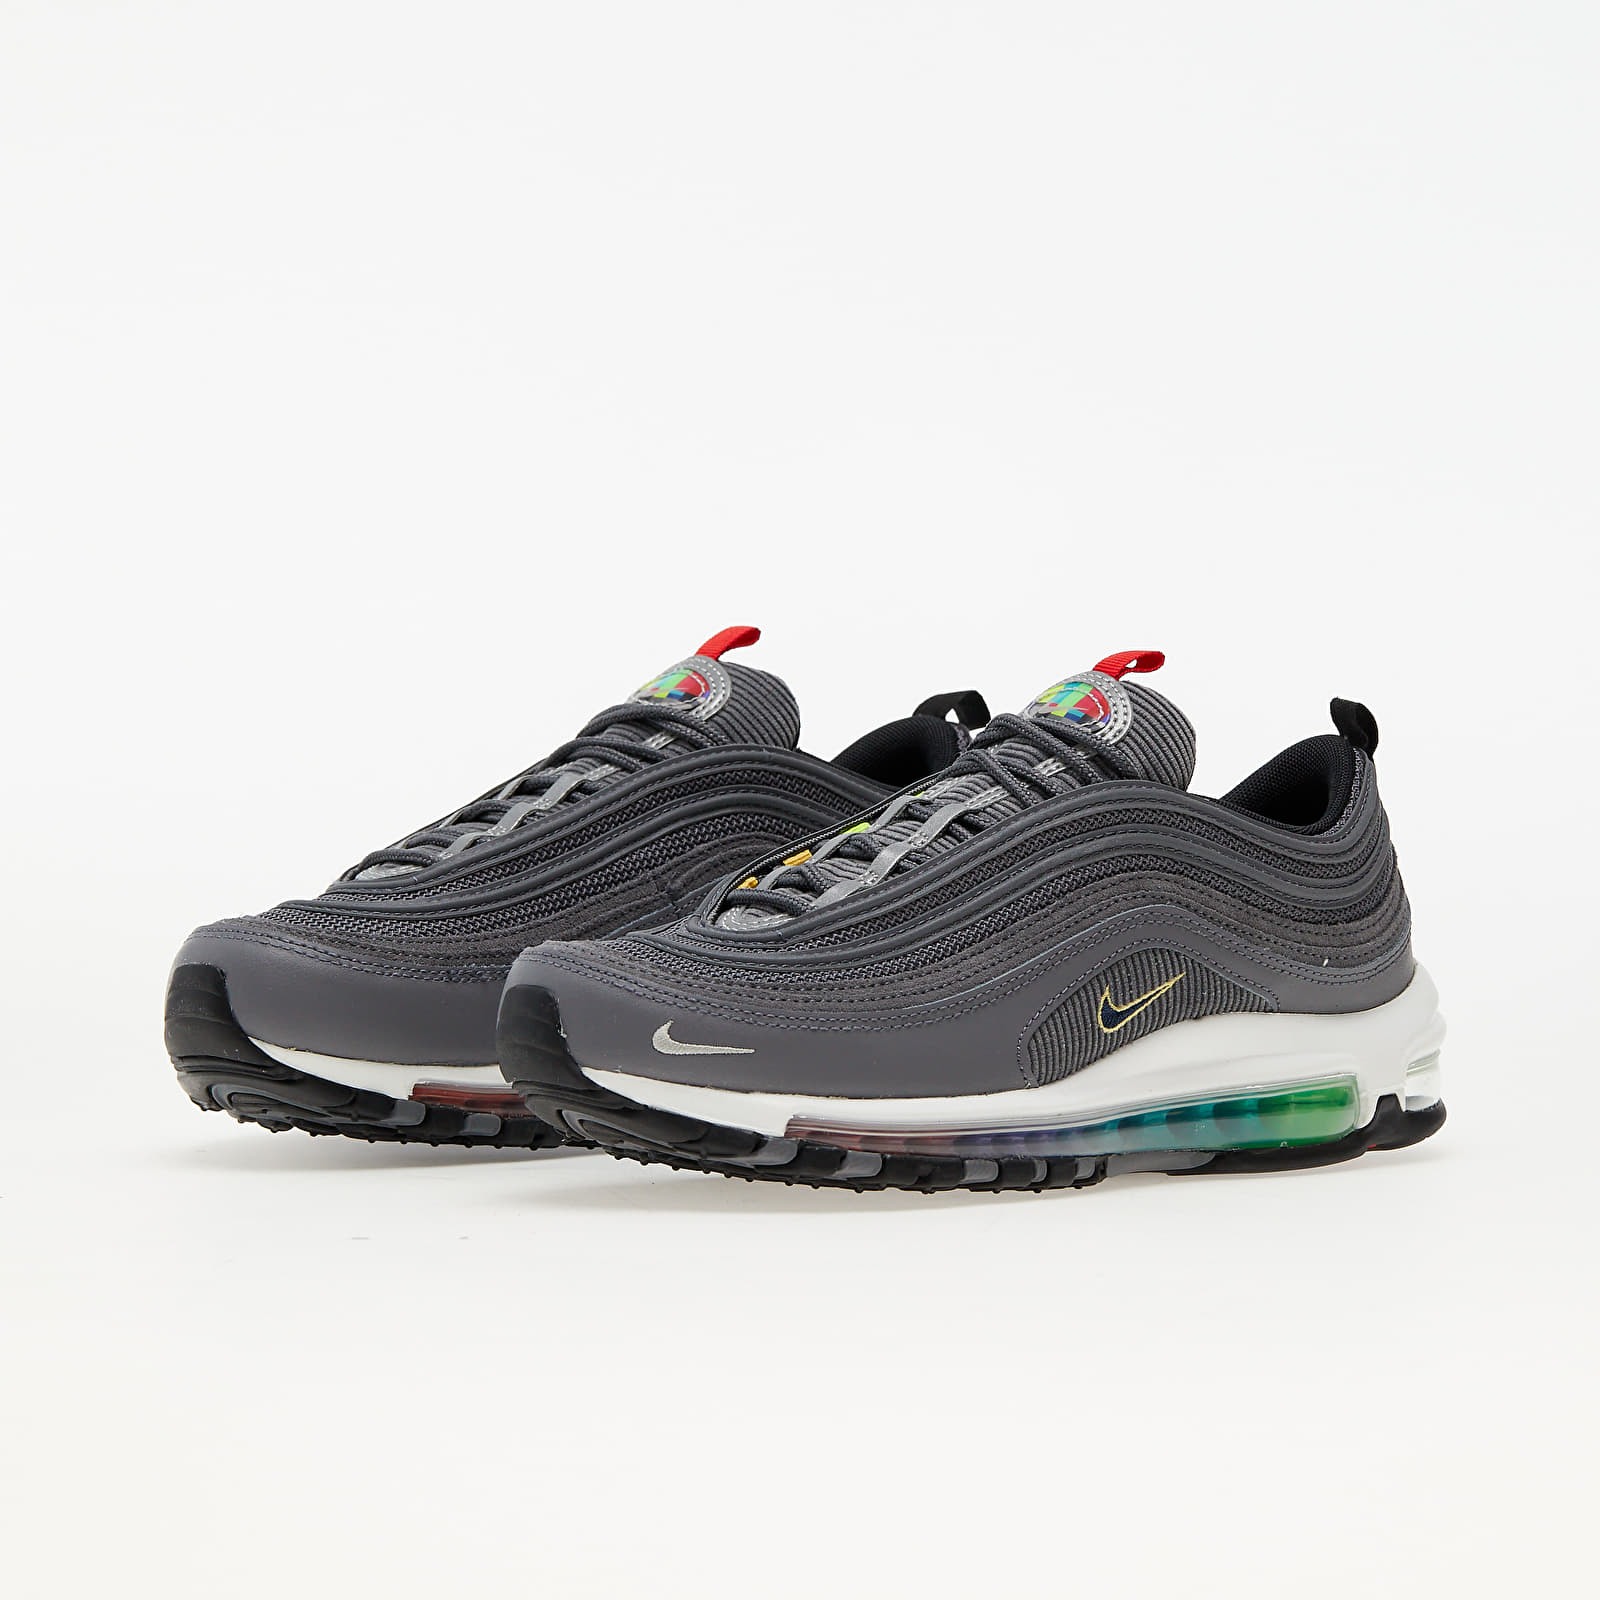 Nike Air Max 97 SE Lt Graphite/ Obsidian-Black | Footshop